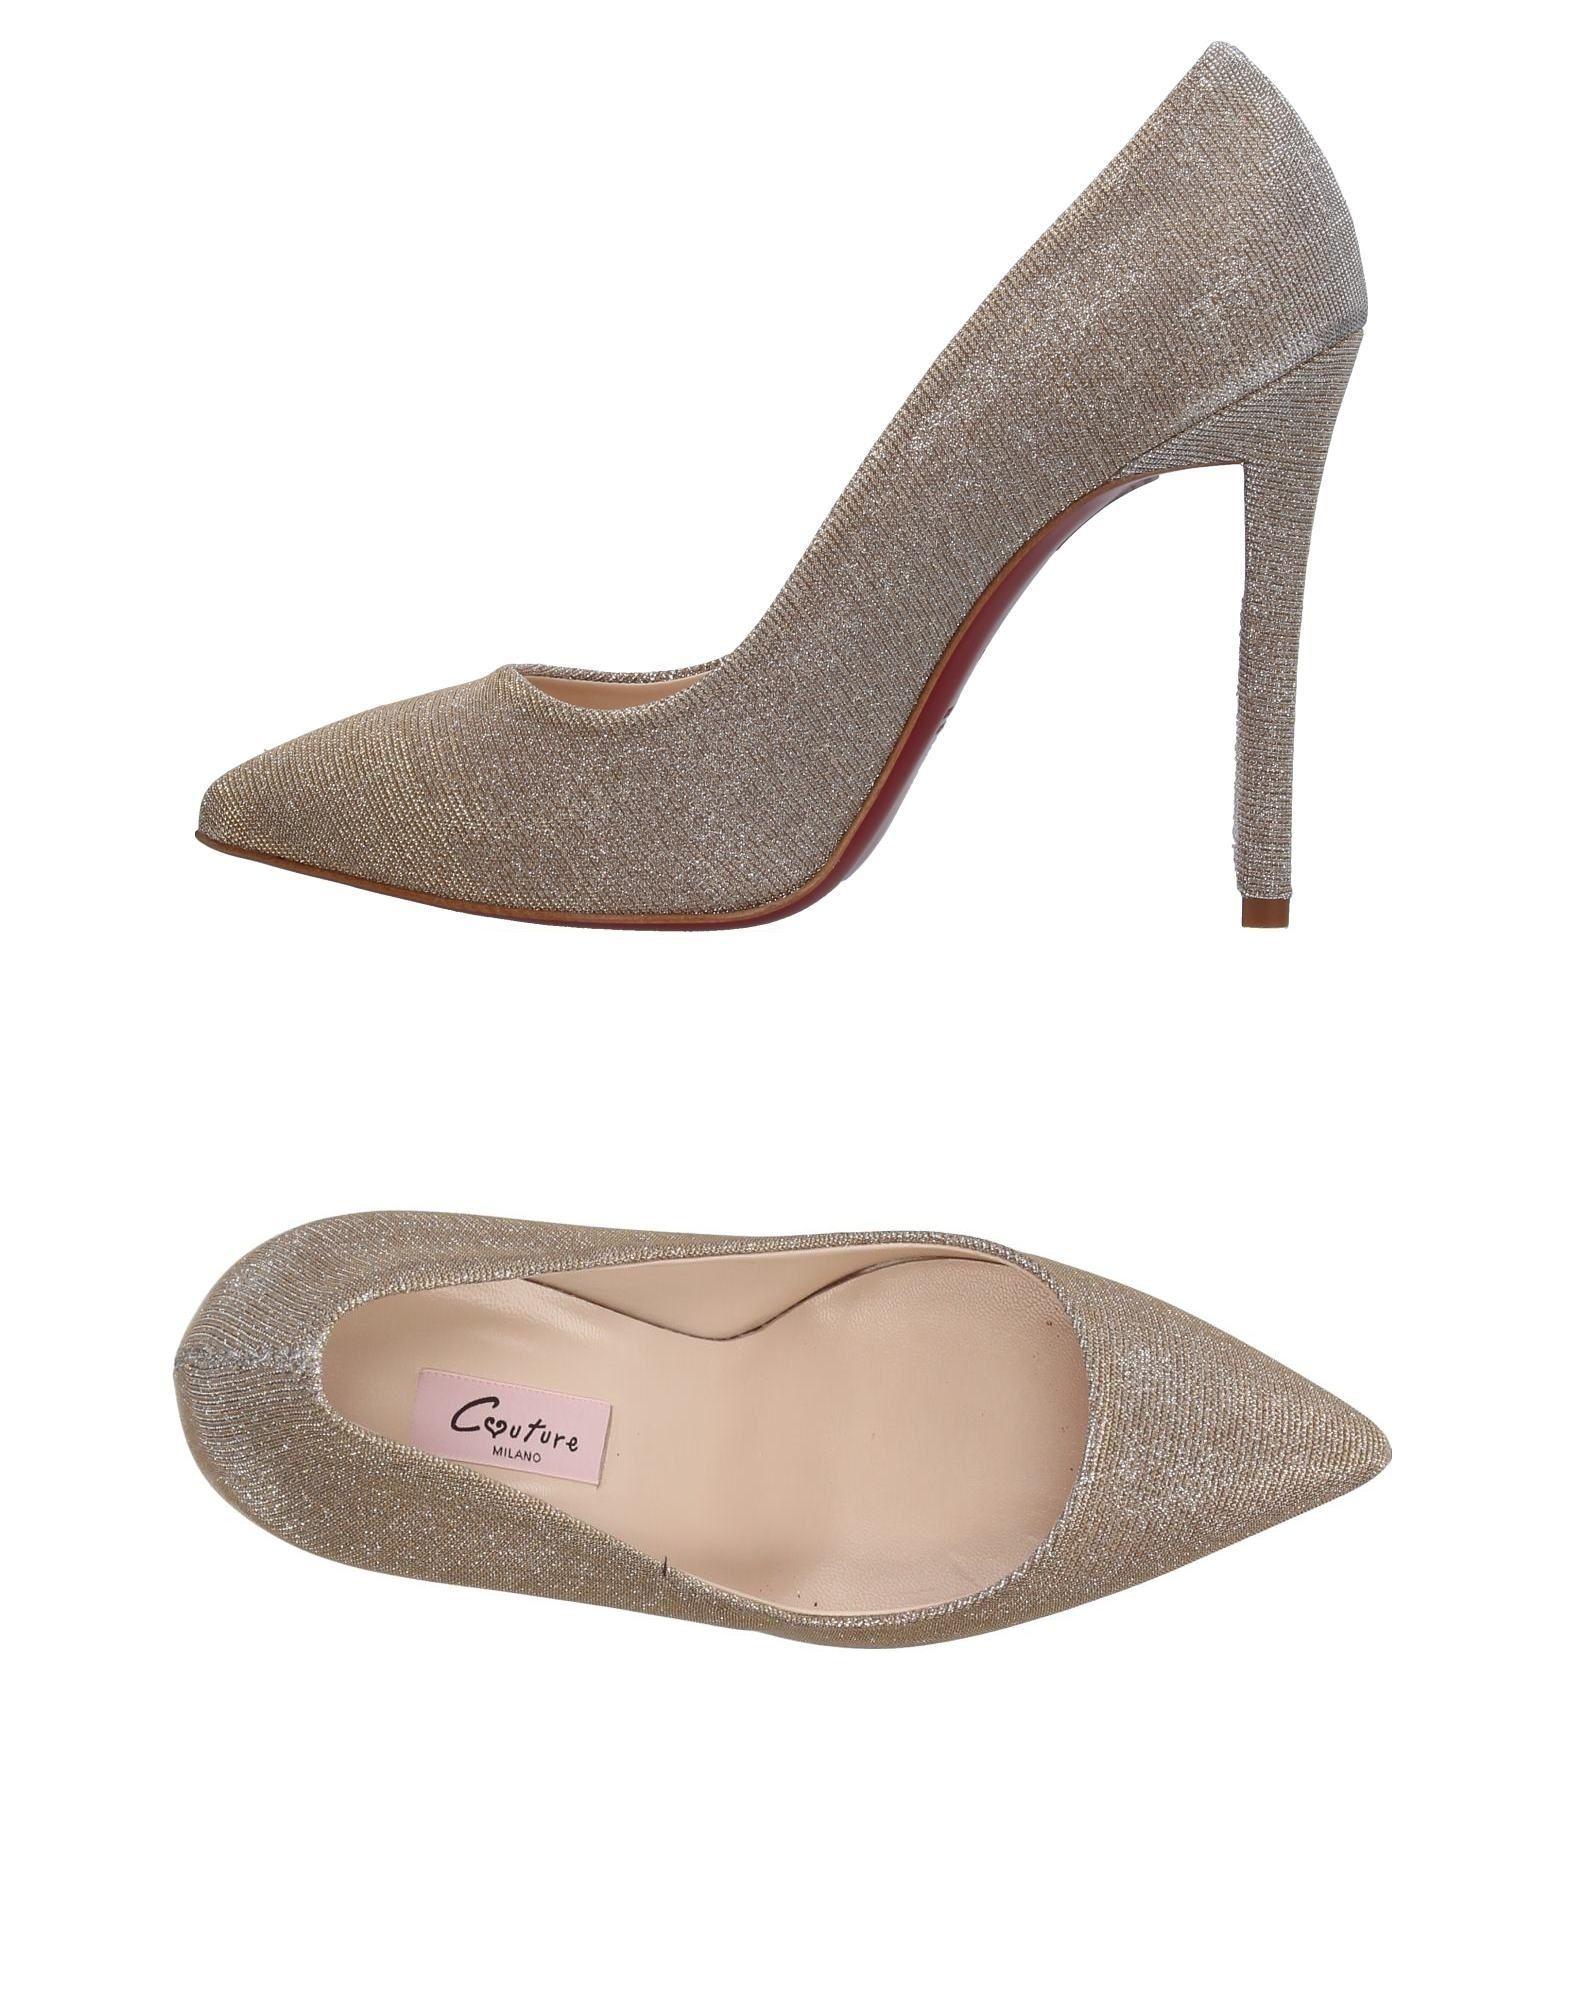 A buon mercato Décolleté Couture Donna - 11396065LL